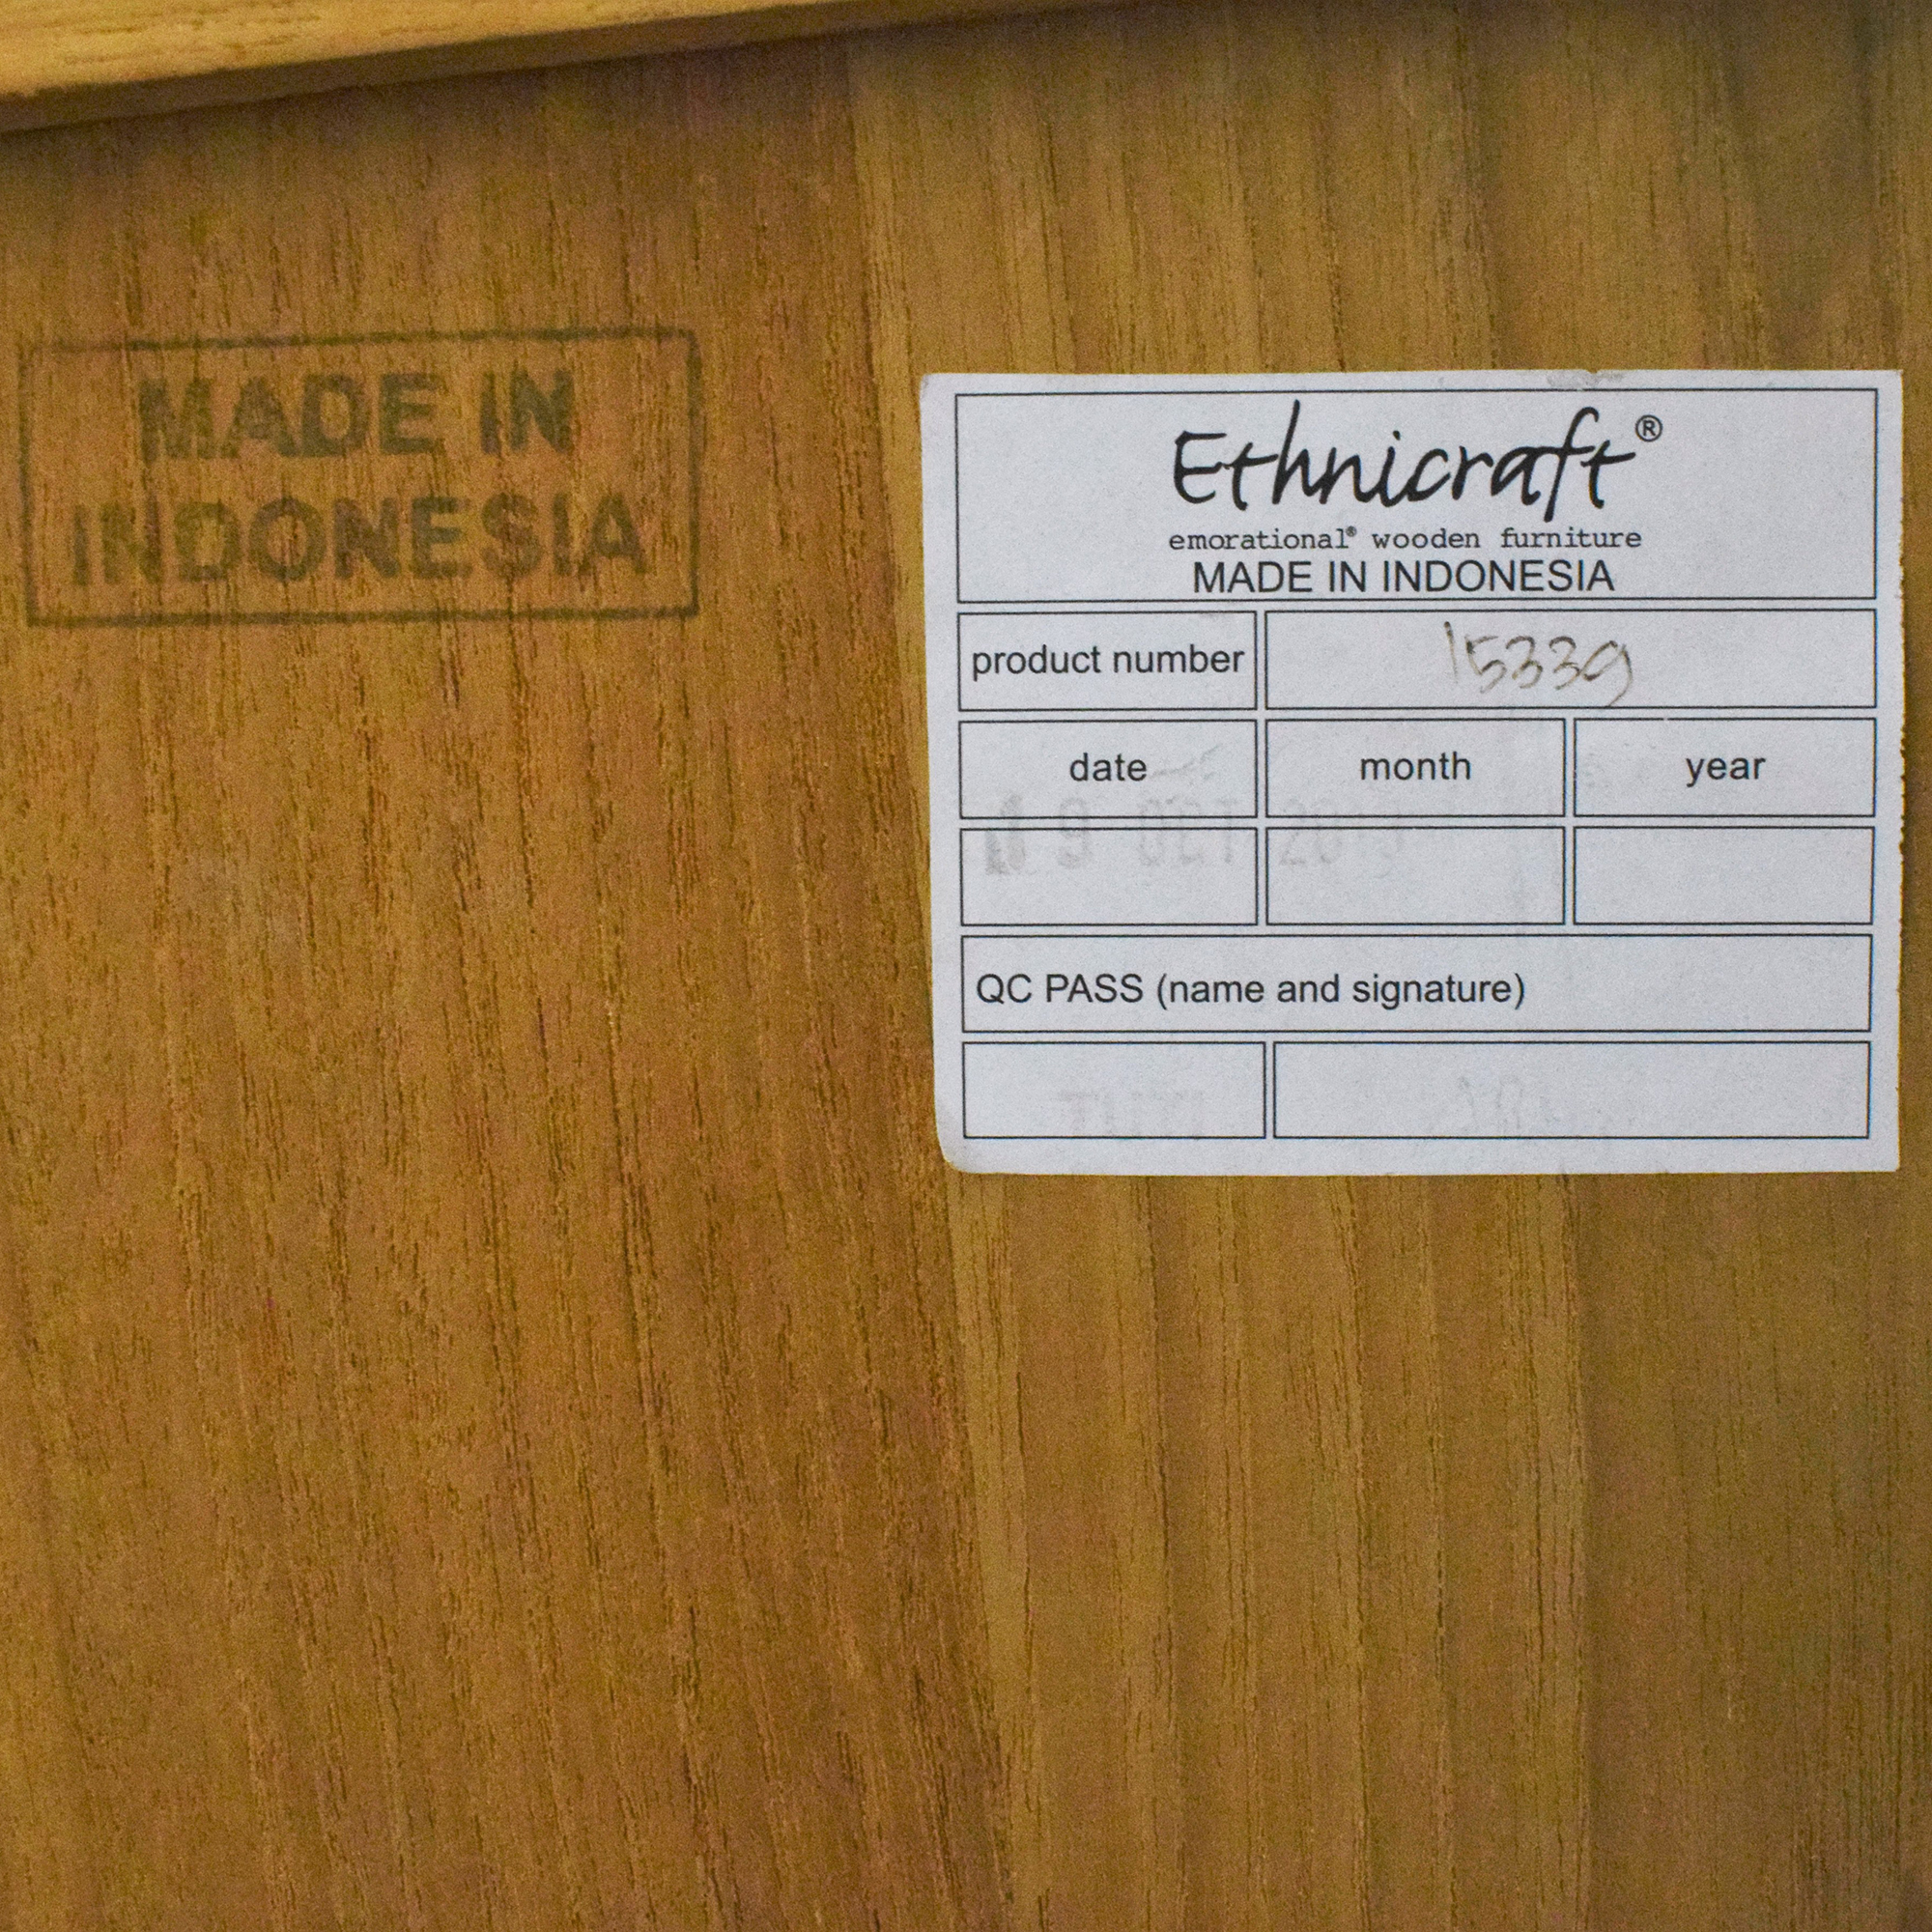 buy Ethnicraft TV Cupboard Ethnicraft